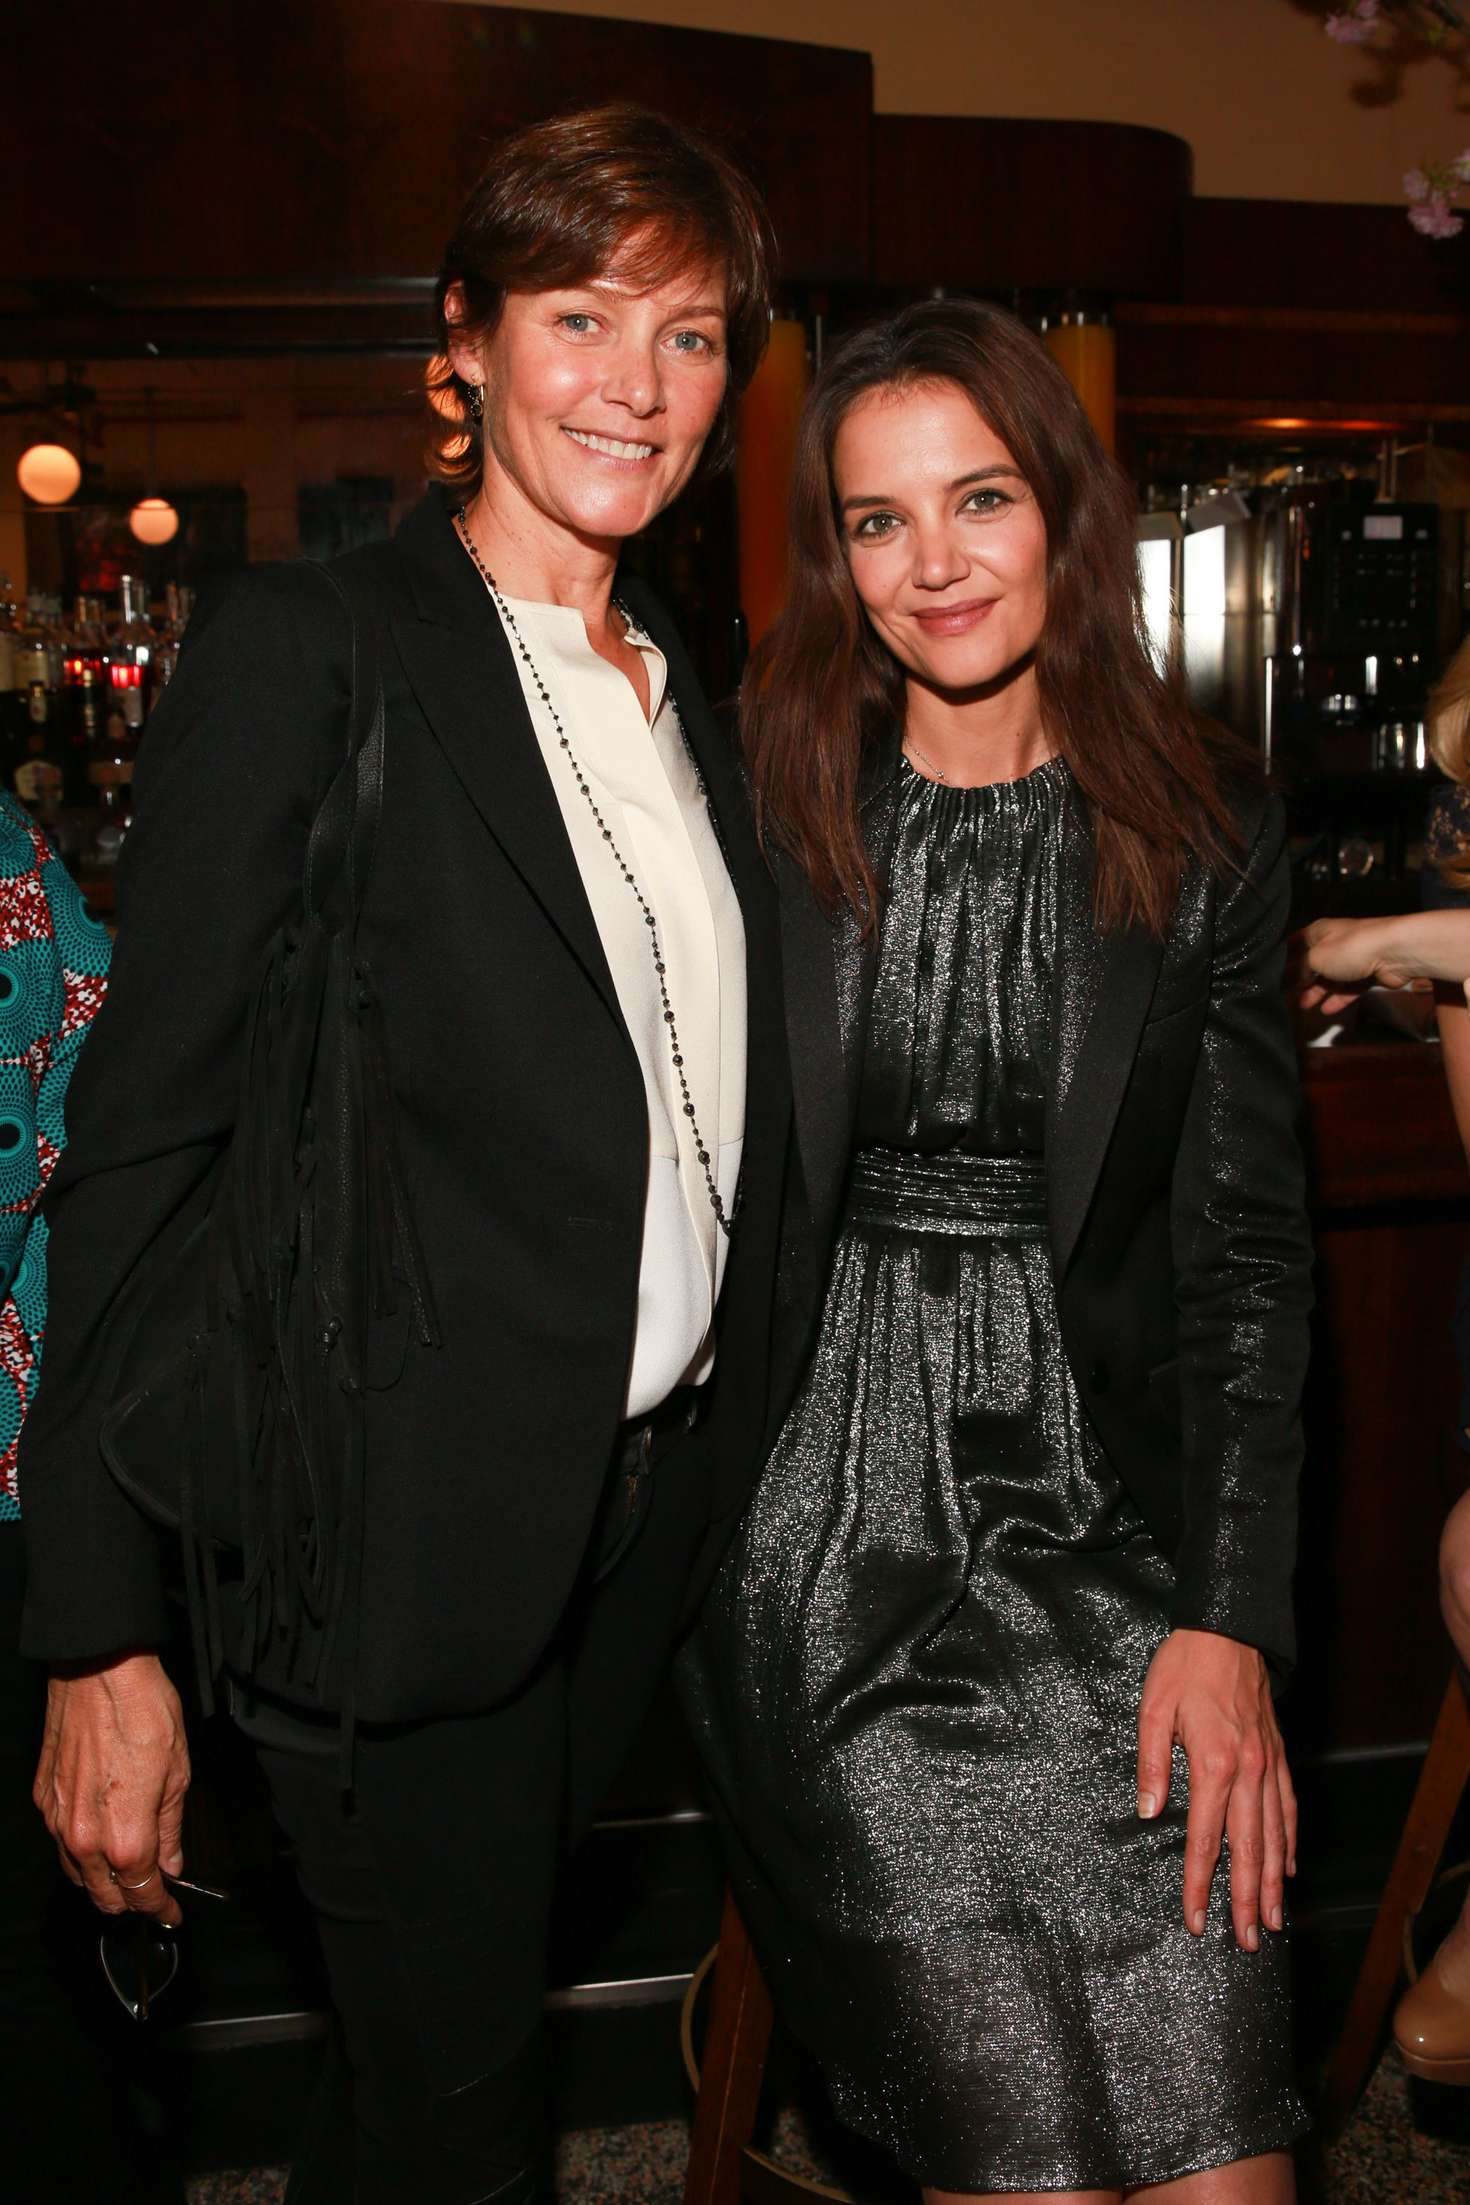 Katie Holmes 2016 : Katie Holmes: Women Filmmakers Luncheon at Tribeca Film Festival 2016 -05